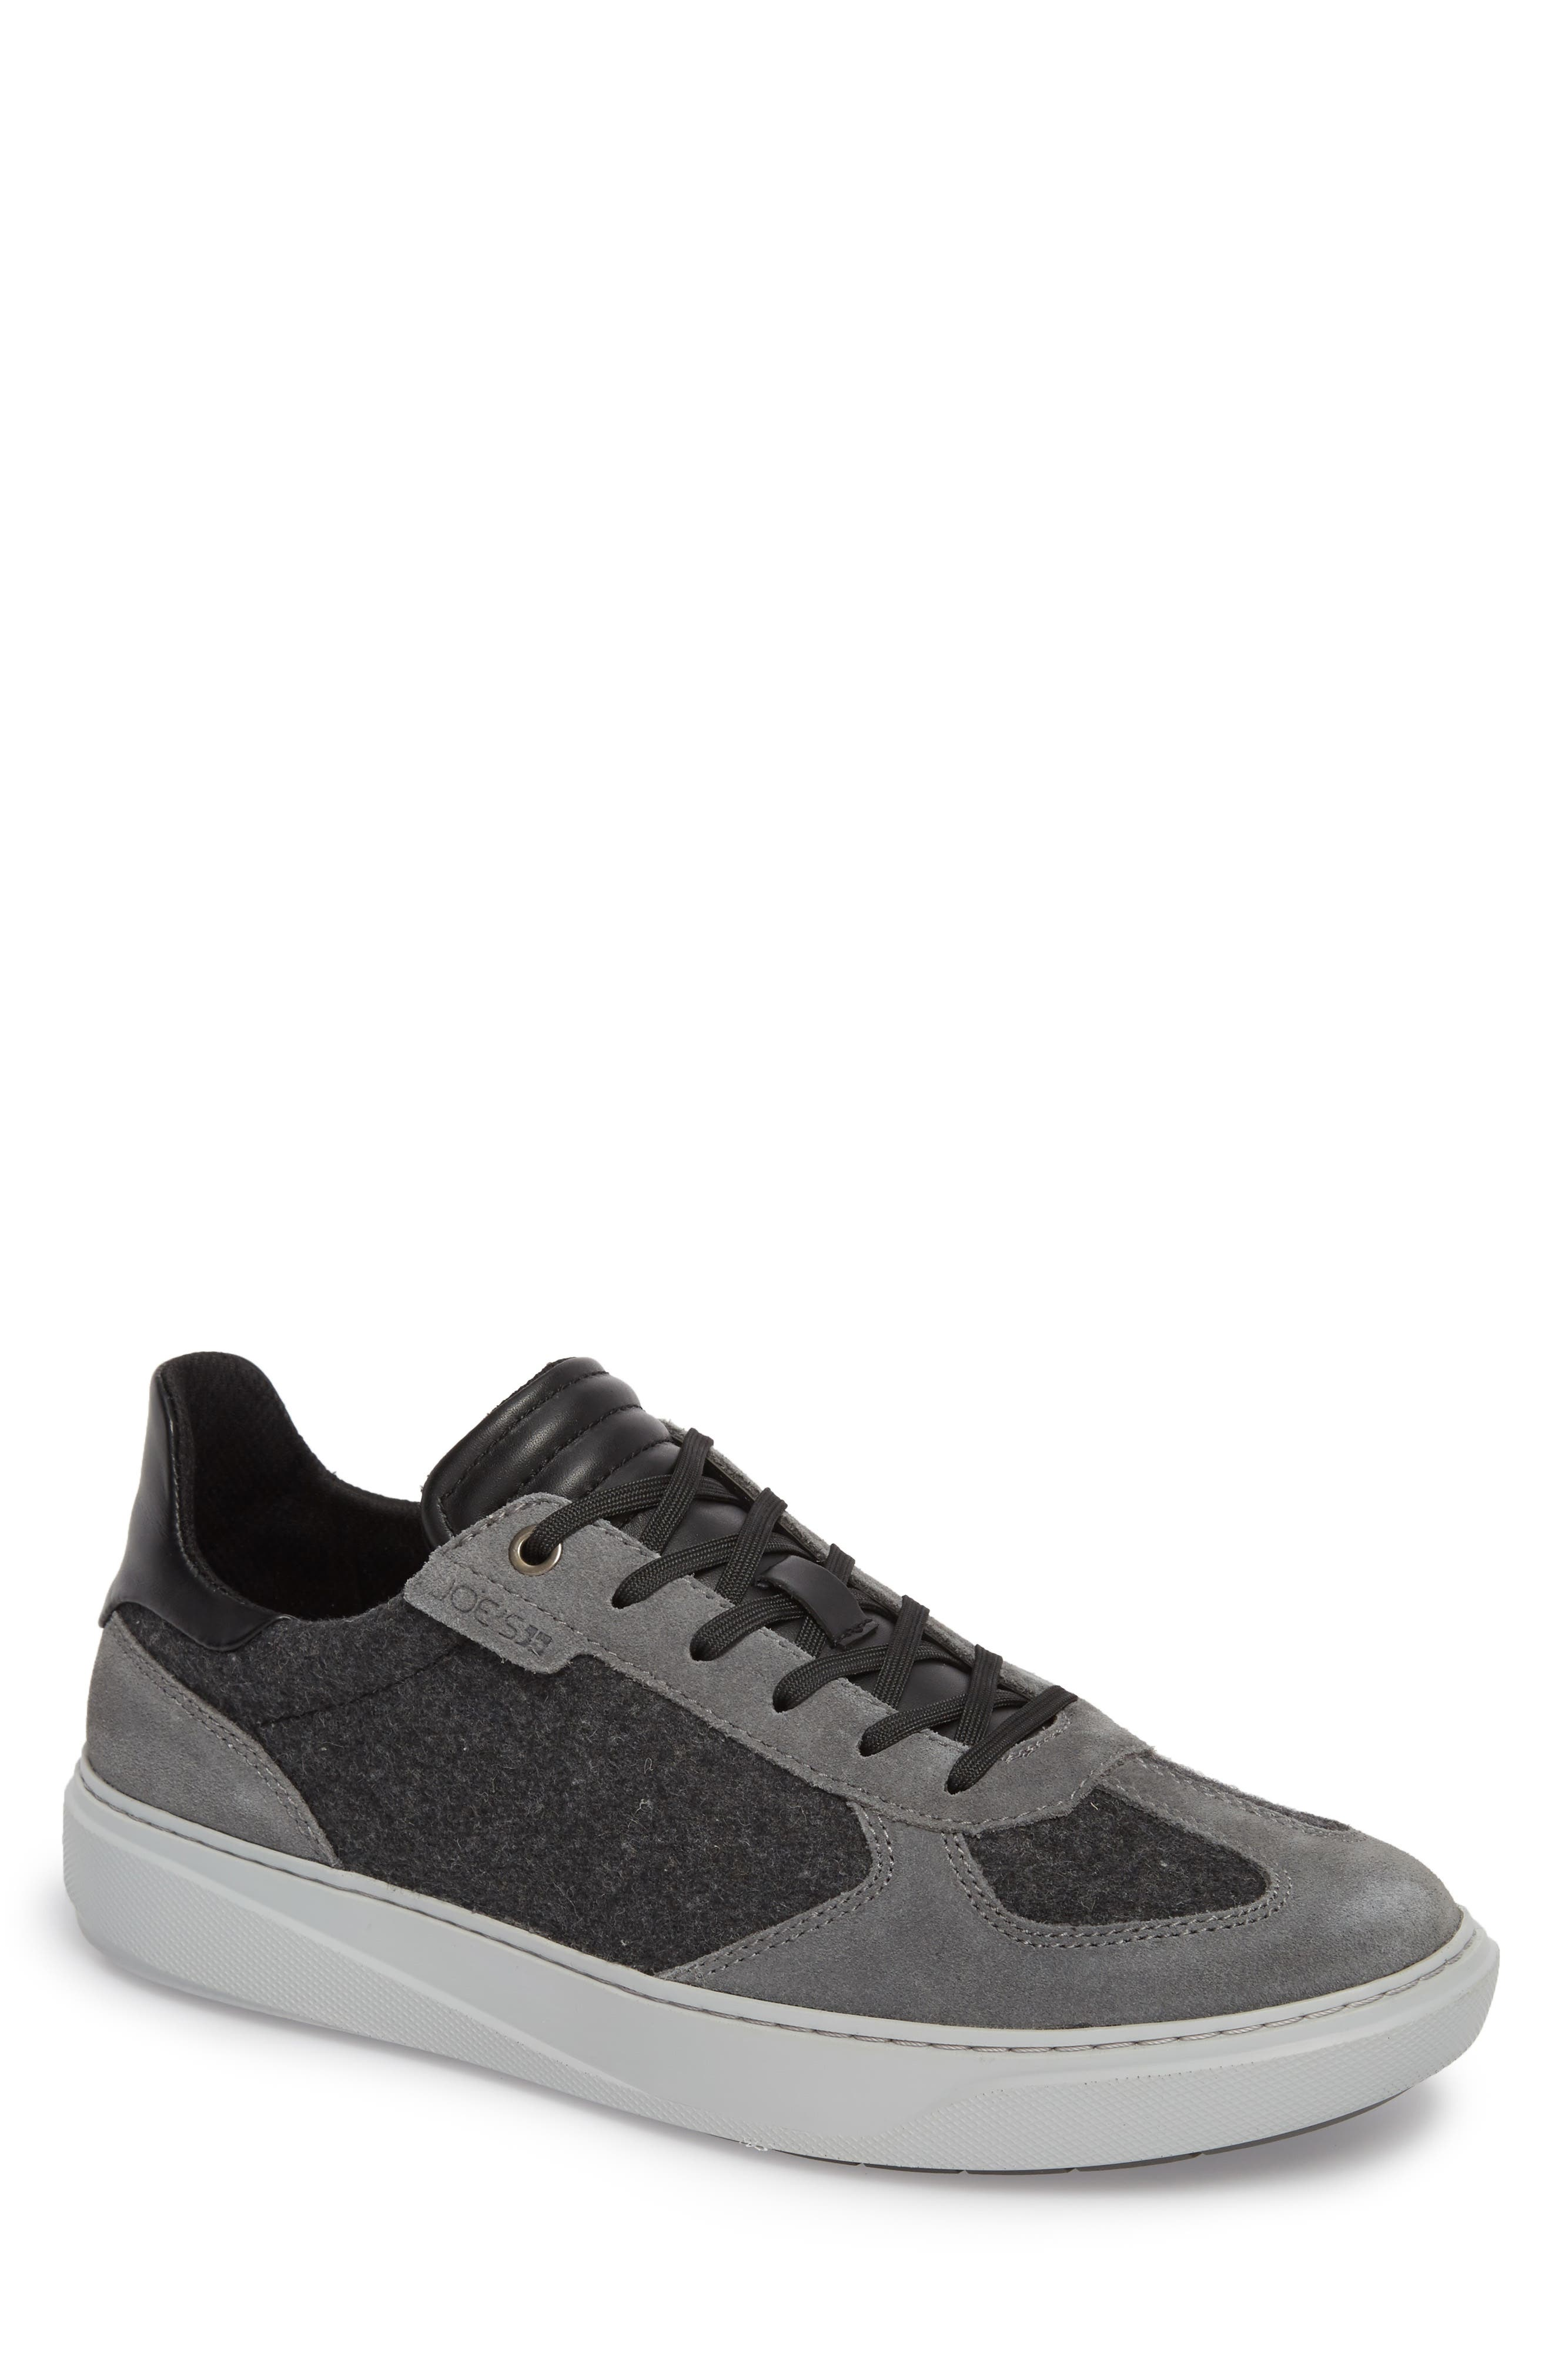 Mo Joe Sneaker,                         Main,                         color, Charcoal Wool/ Suede